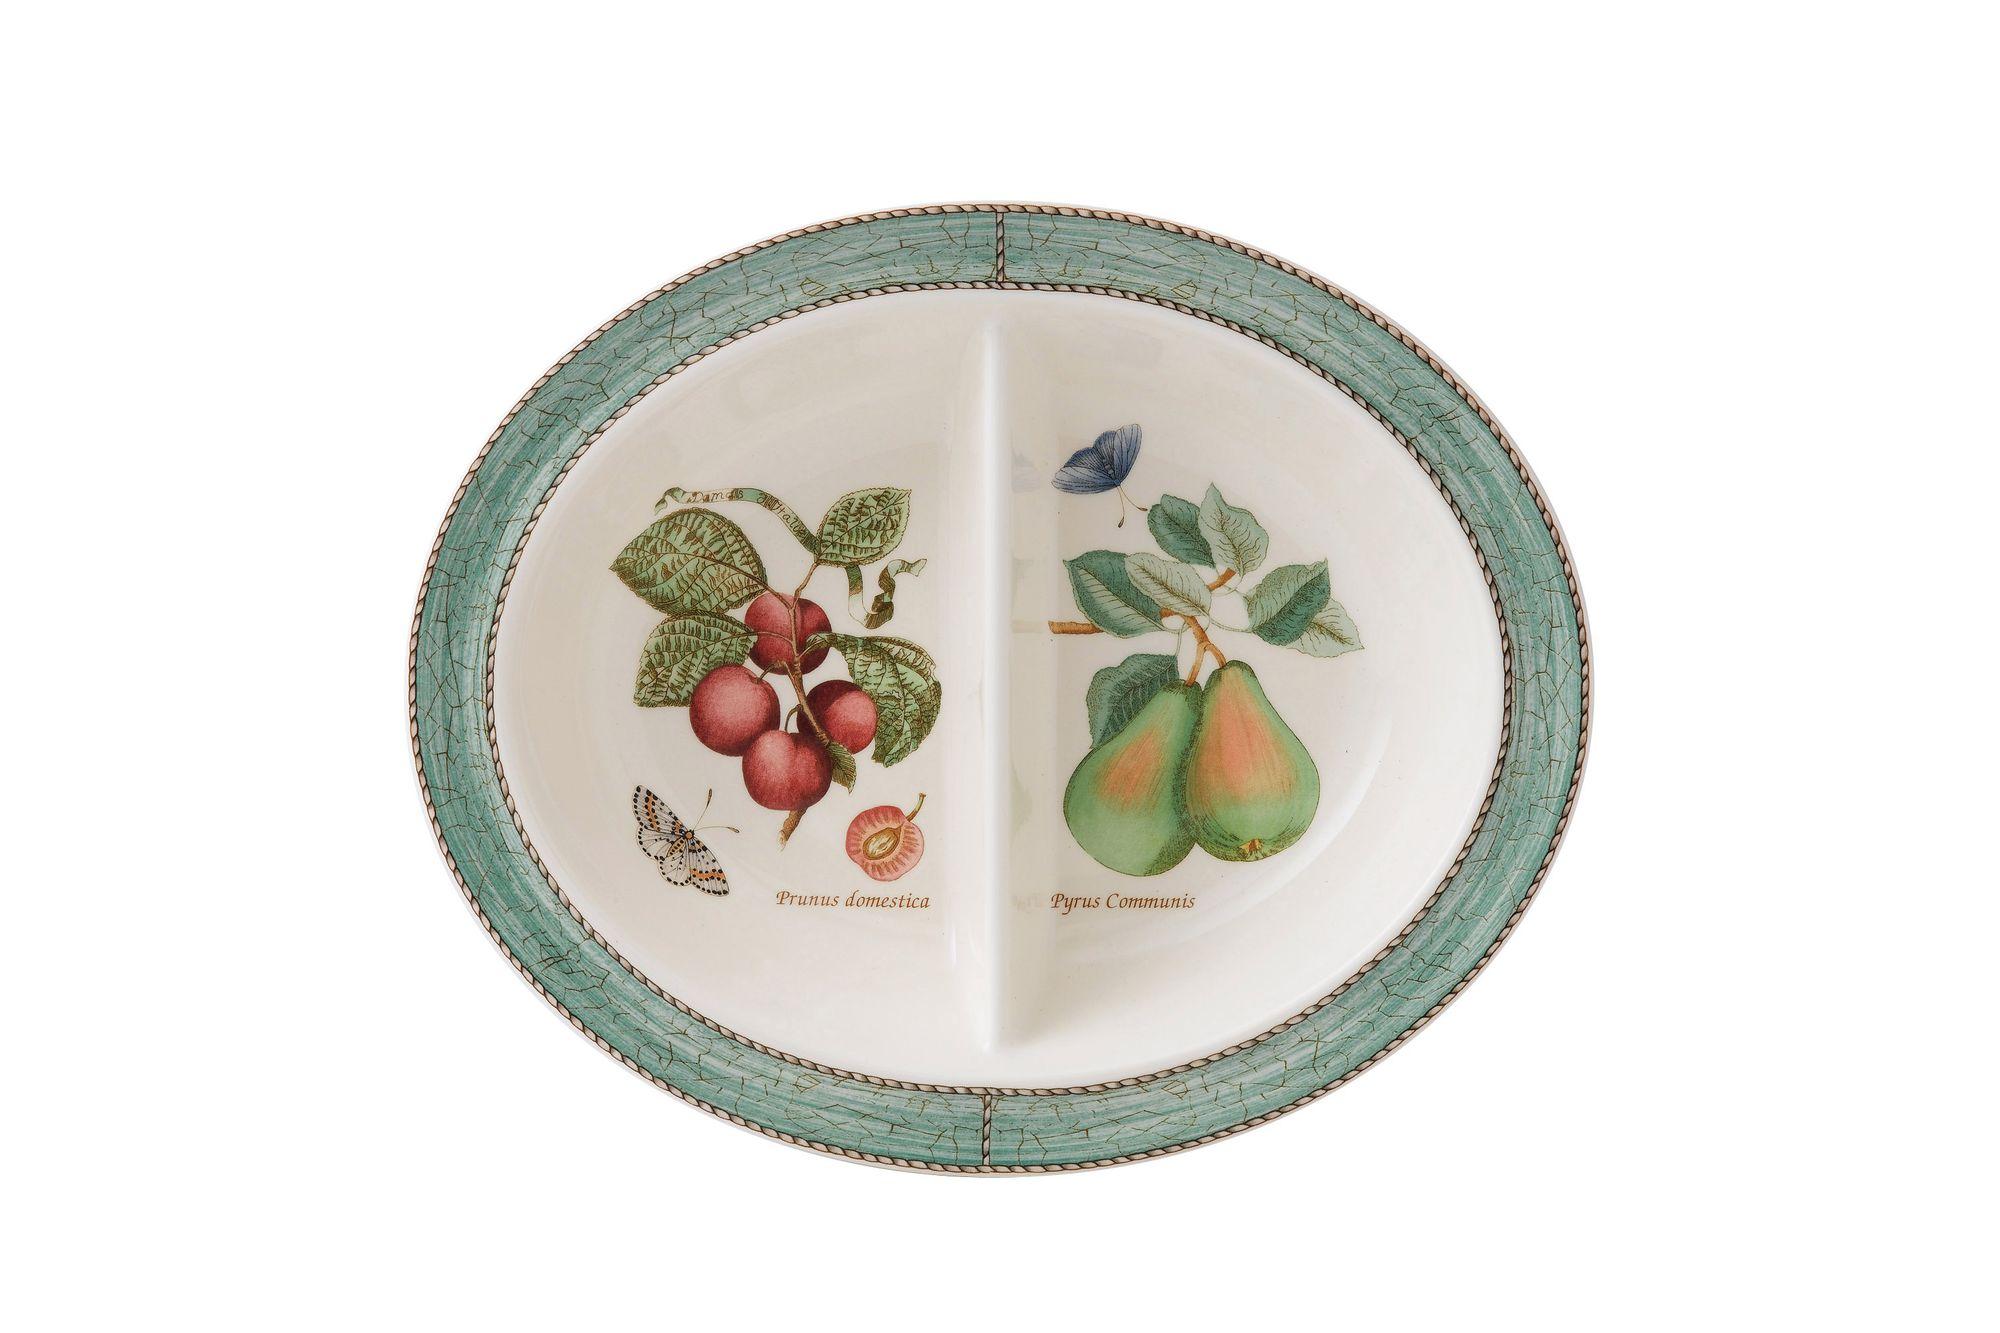 Wedgwood Sarah's Garden Vegetable Dish (Divided) Green thumb 1